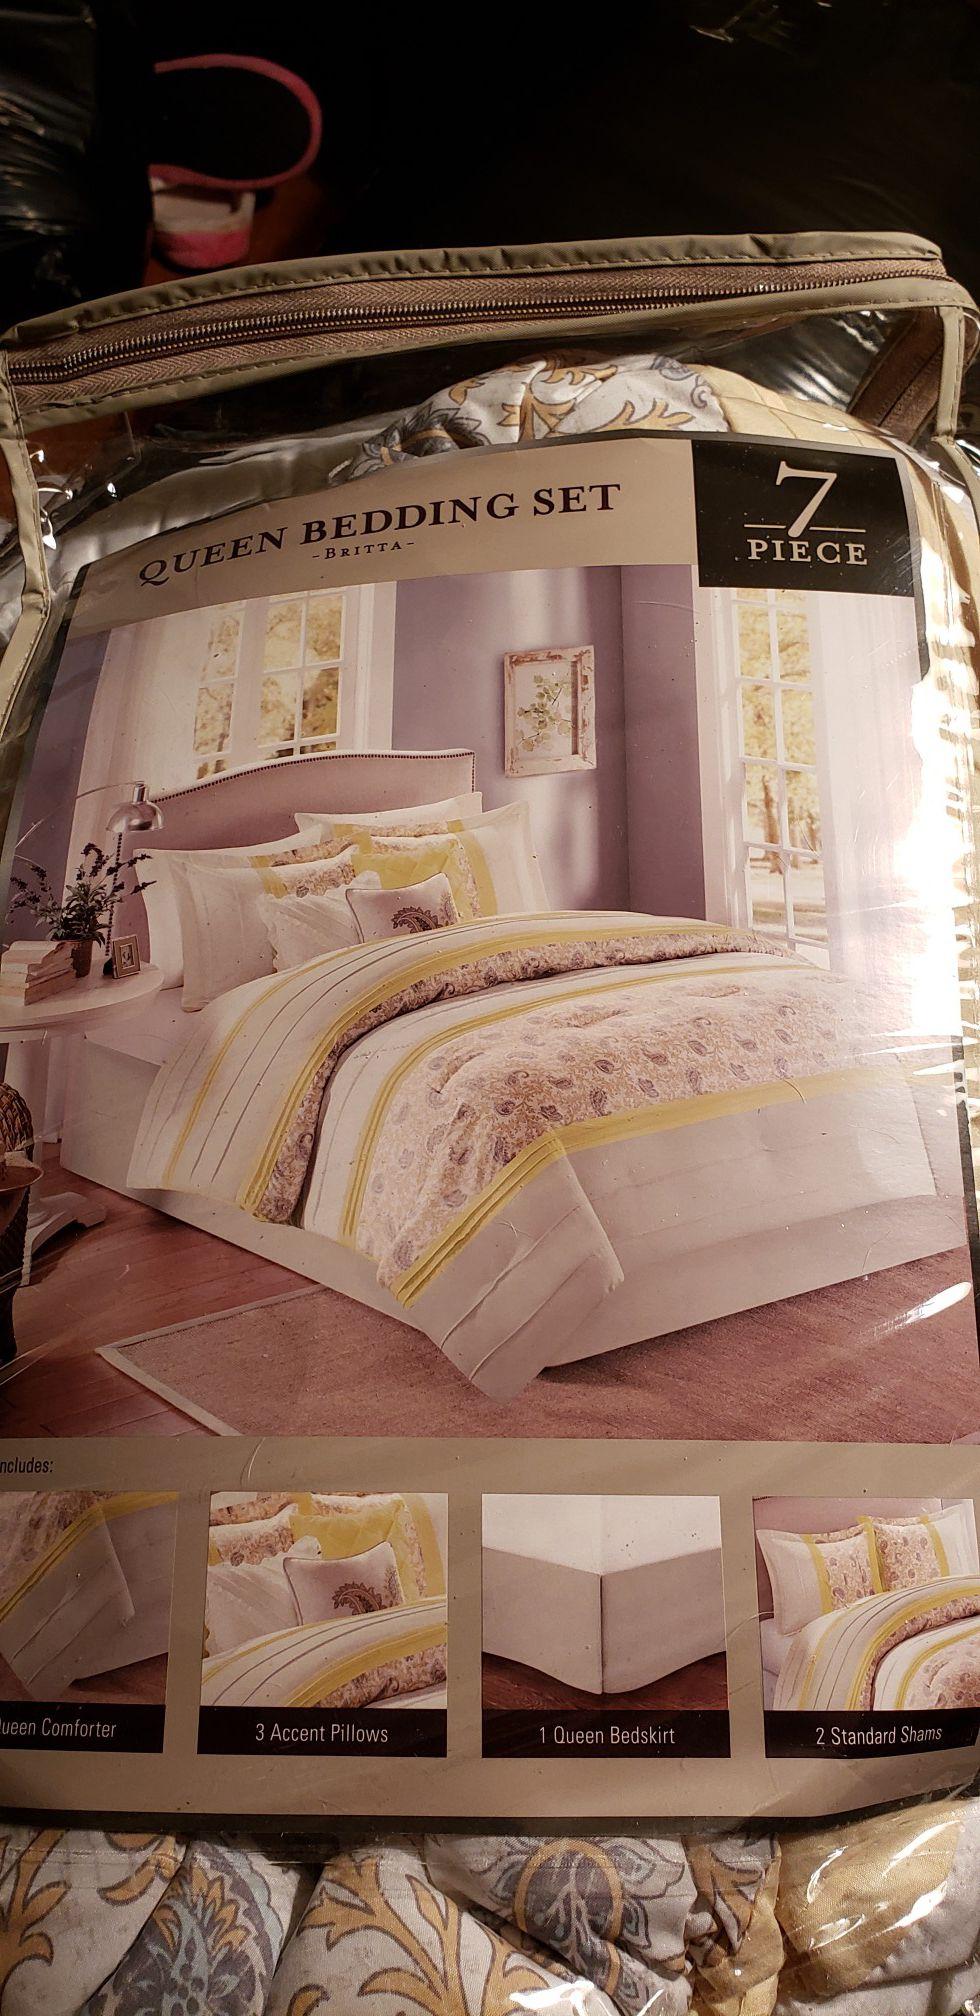 7 Pc Queen Bedding Set NEW $80 obo